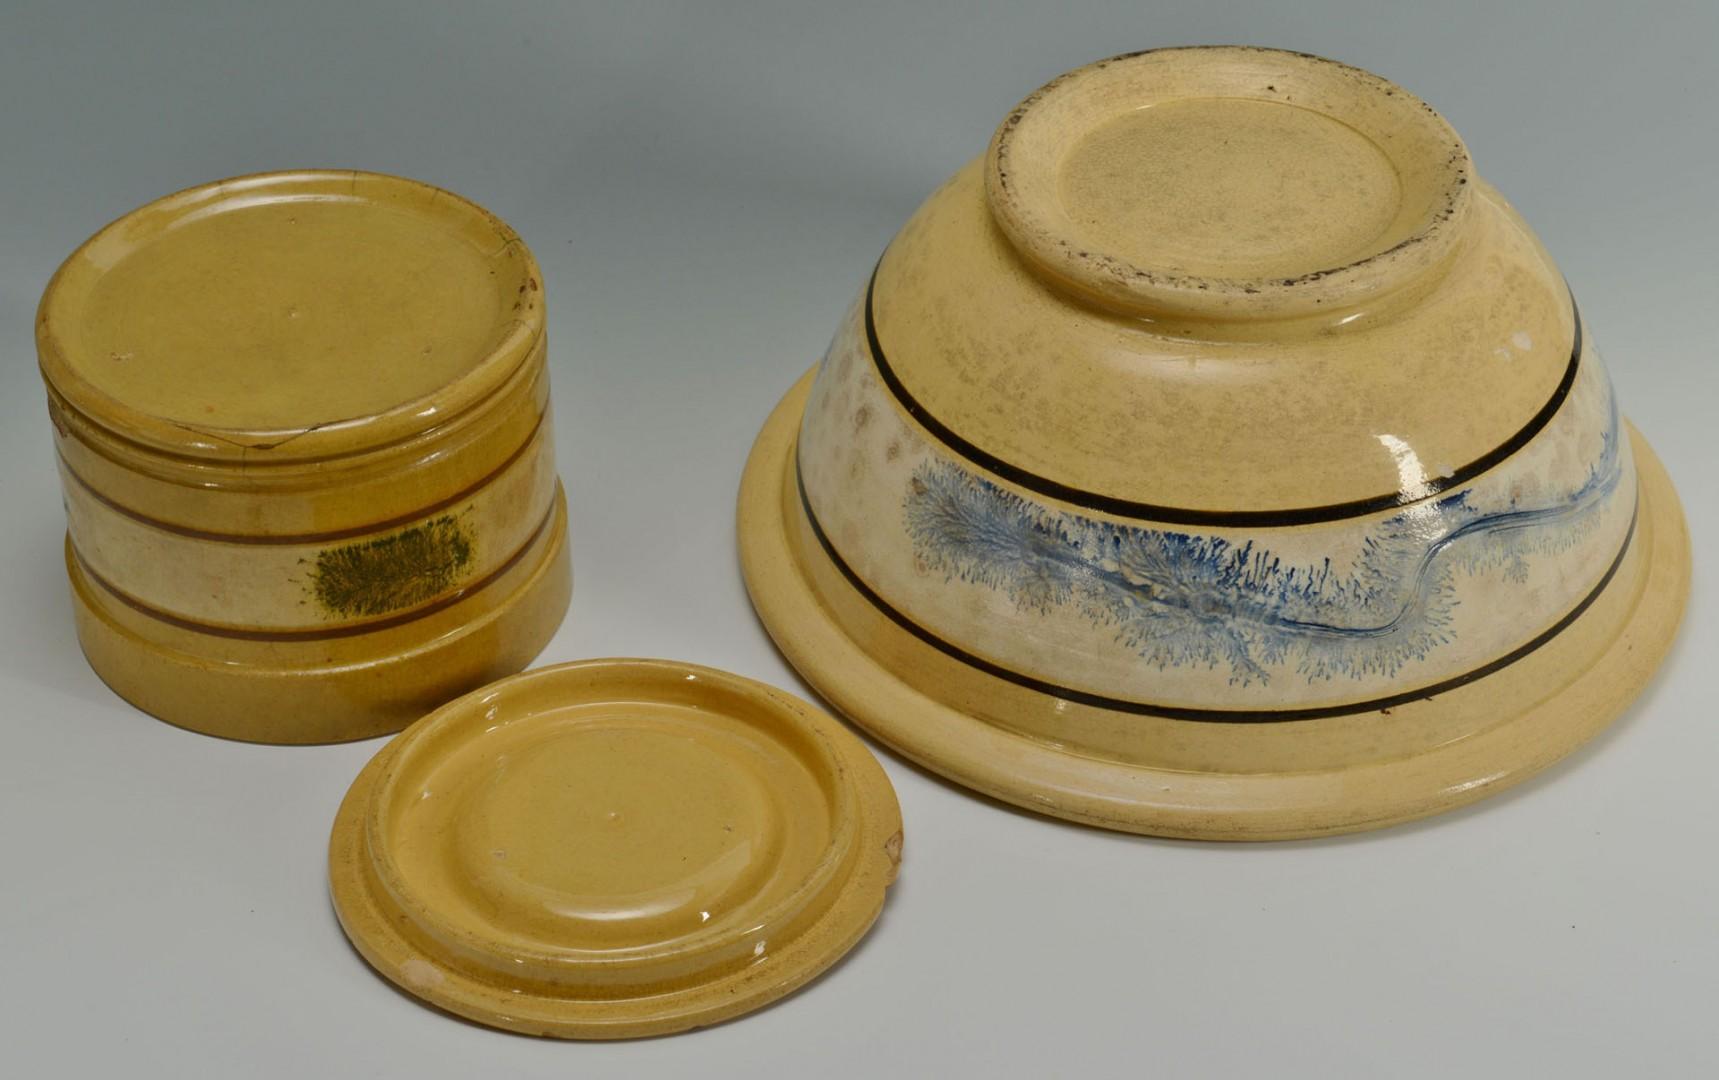 5 Pieces of Yellowware mocha seaweed patt.